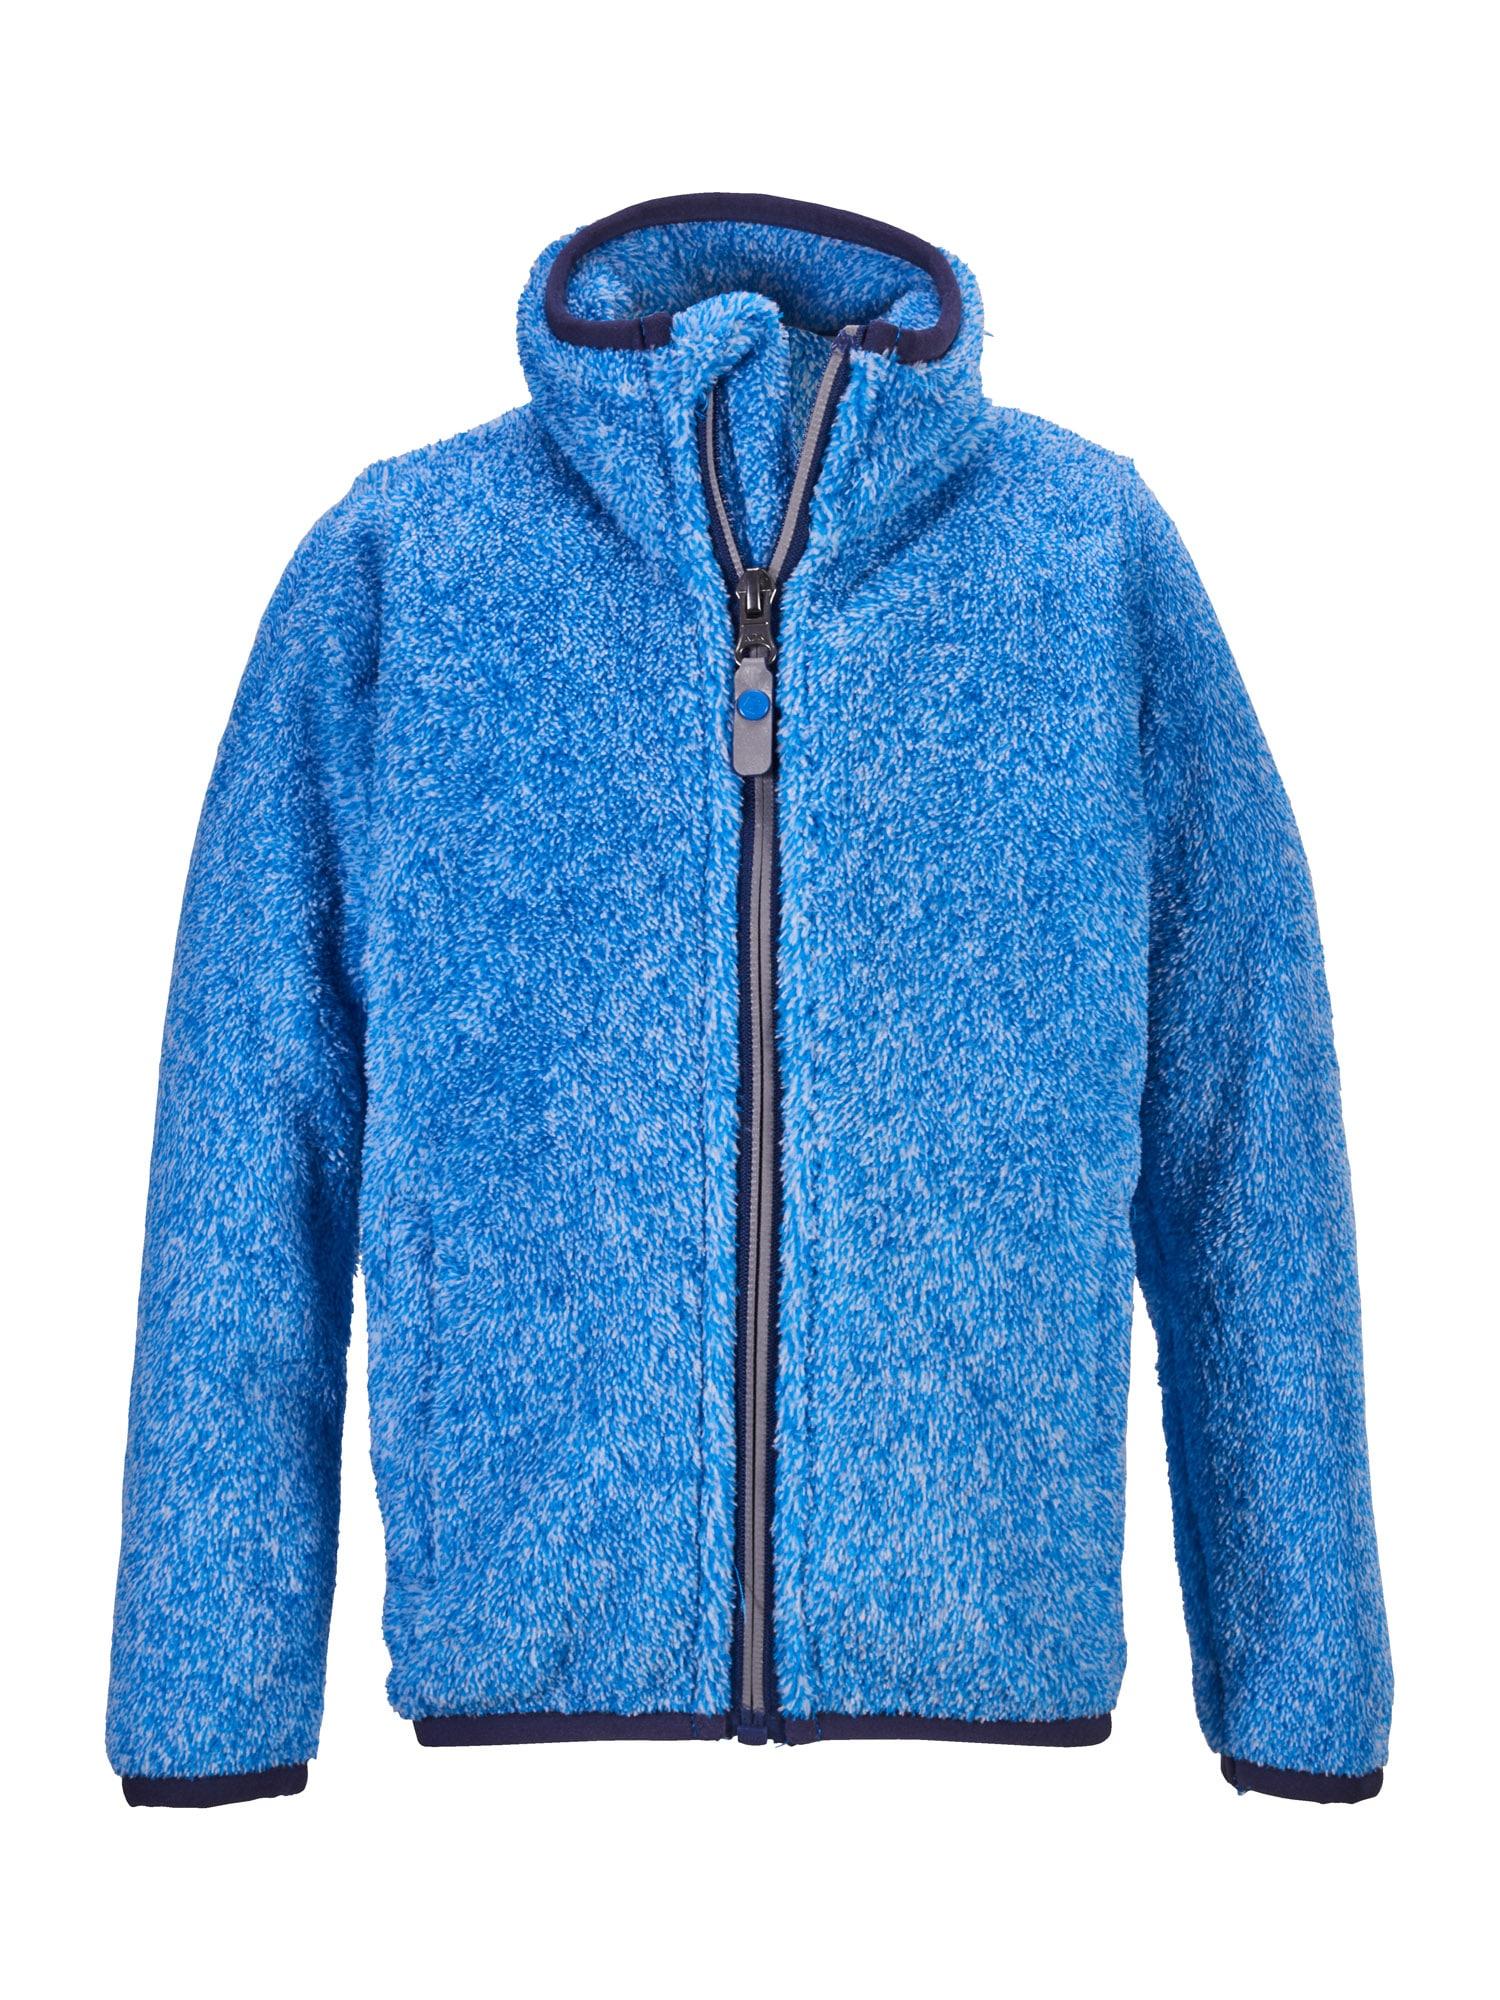 "KILLTEC Funkcinis flisinis džemperis sodri mėlyna (""karališka"")"